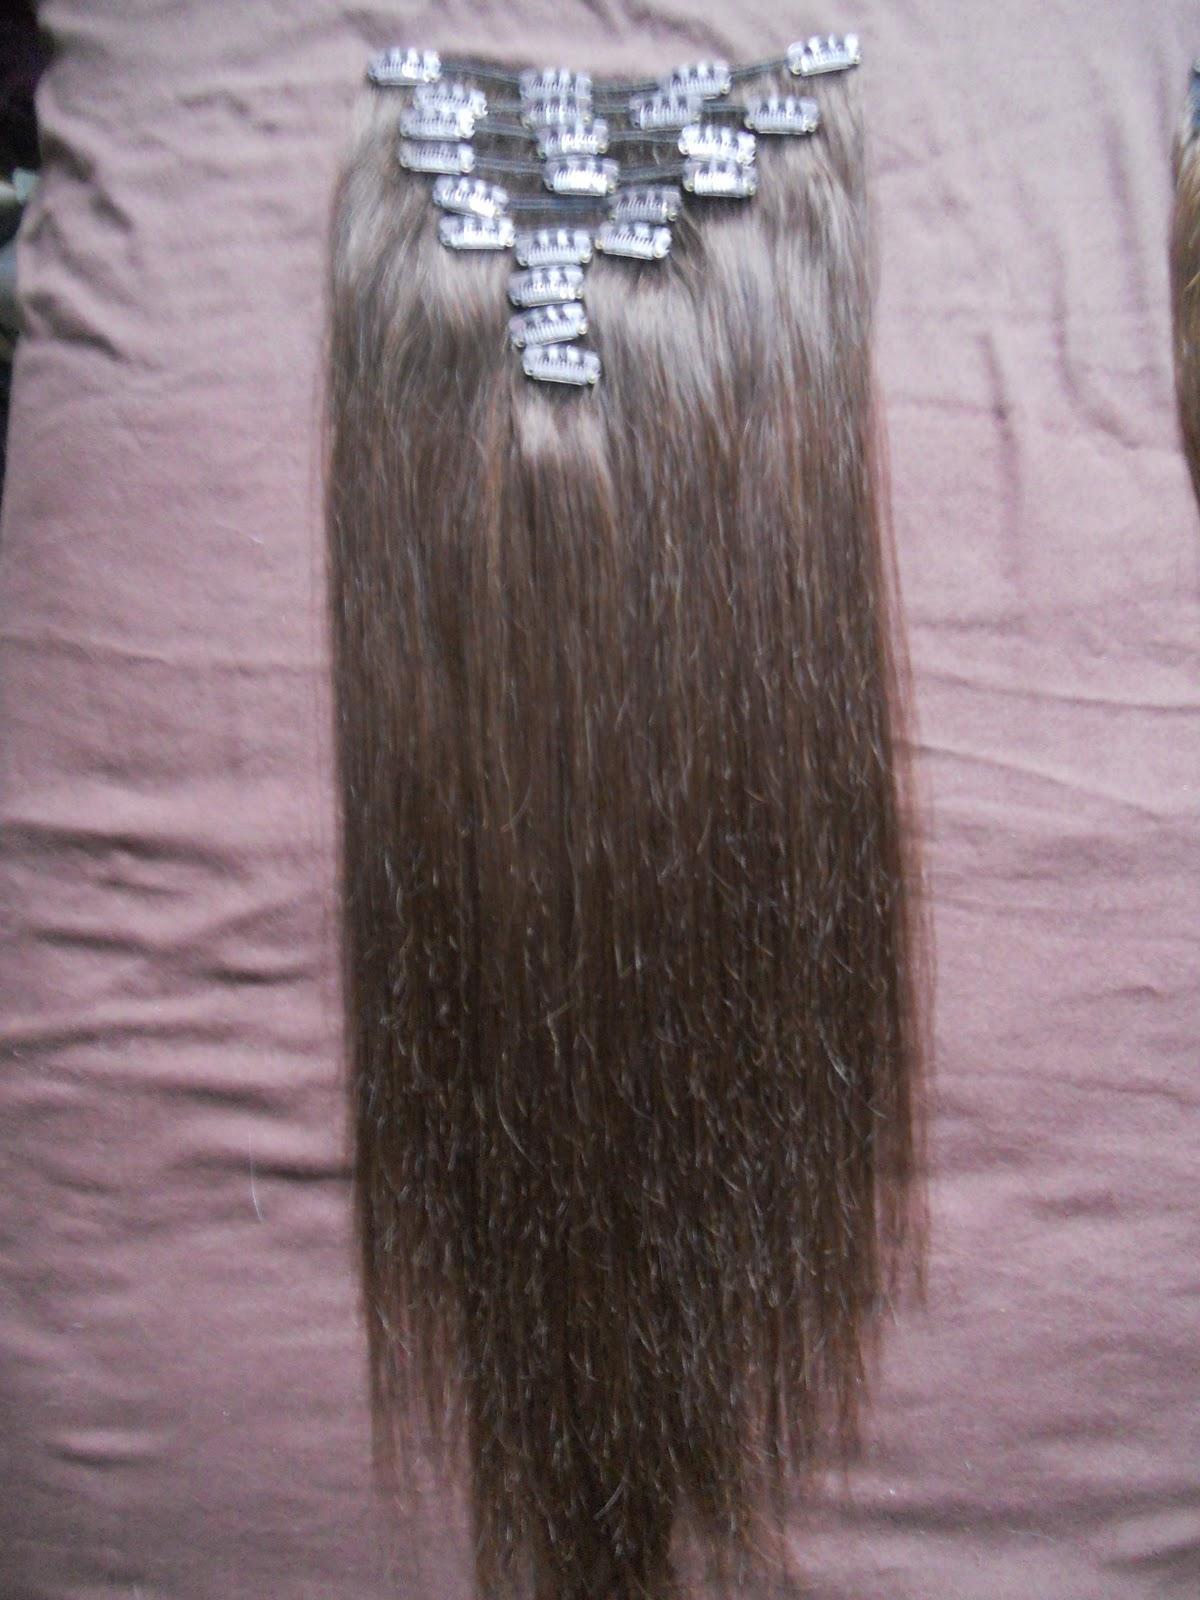 Samanth19 foxylocks headkandy and halo hair extensions foxylocks extensions pmusecretfo Gallery